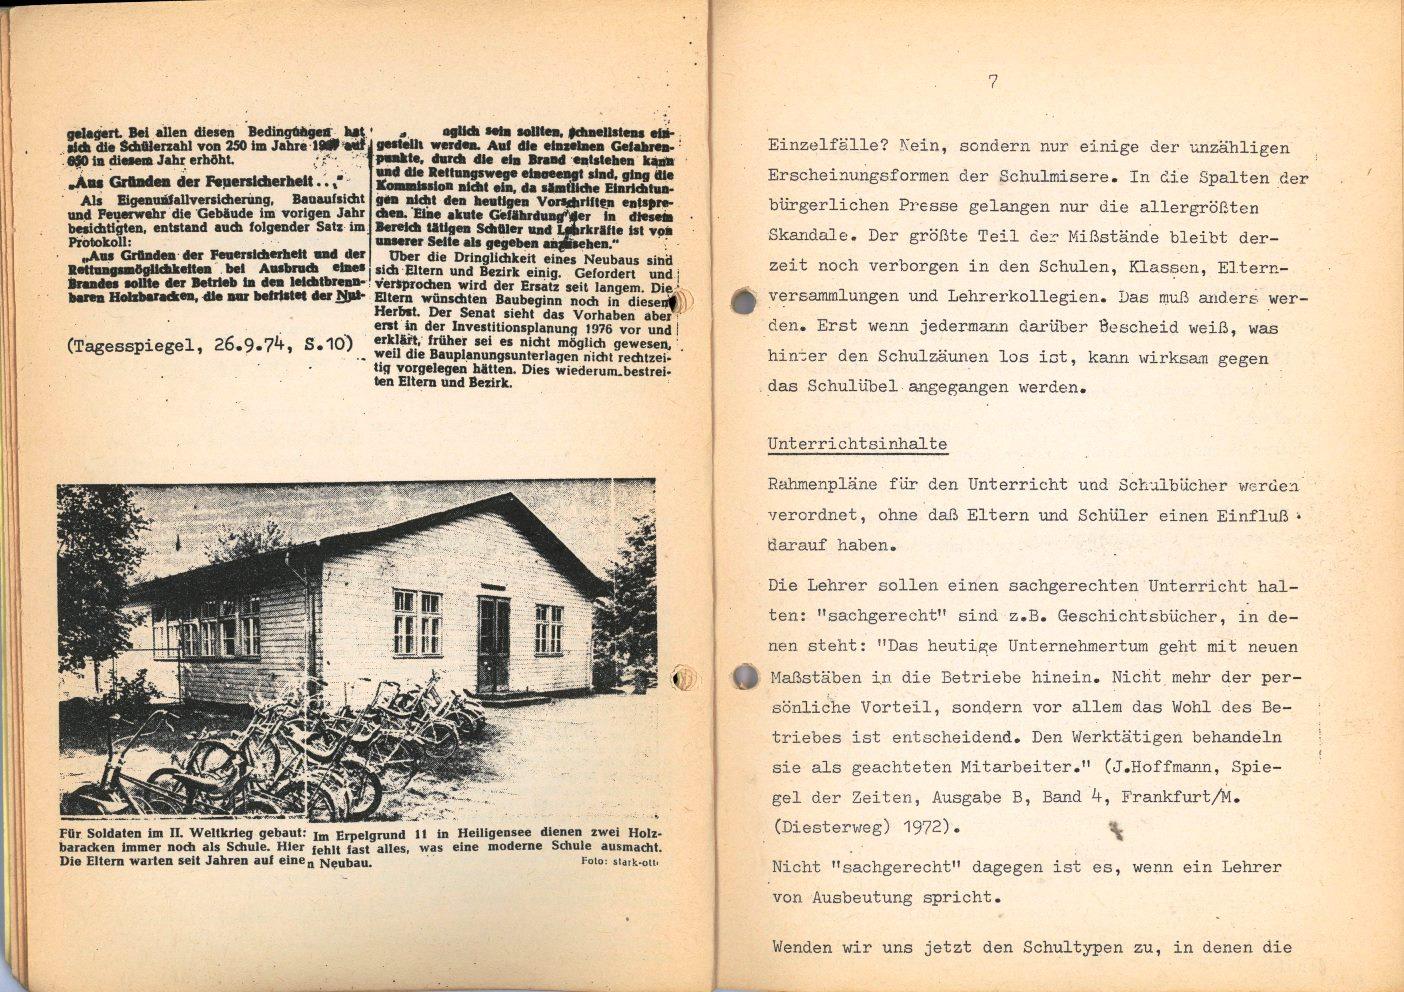 Berlin_SMV_GUV_1974_Schulmisere_06